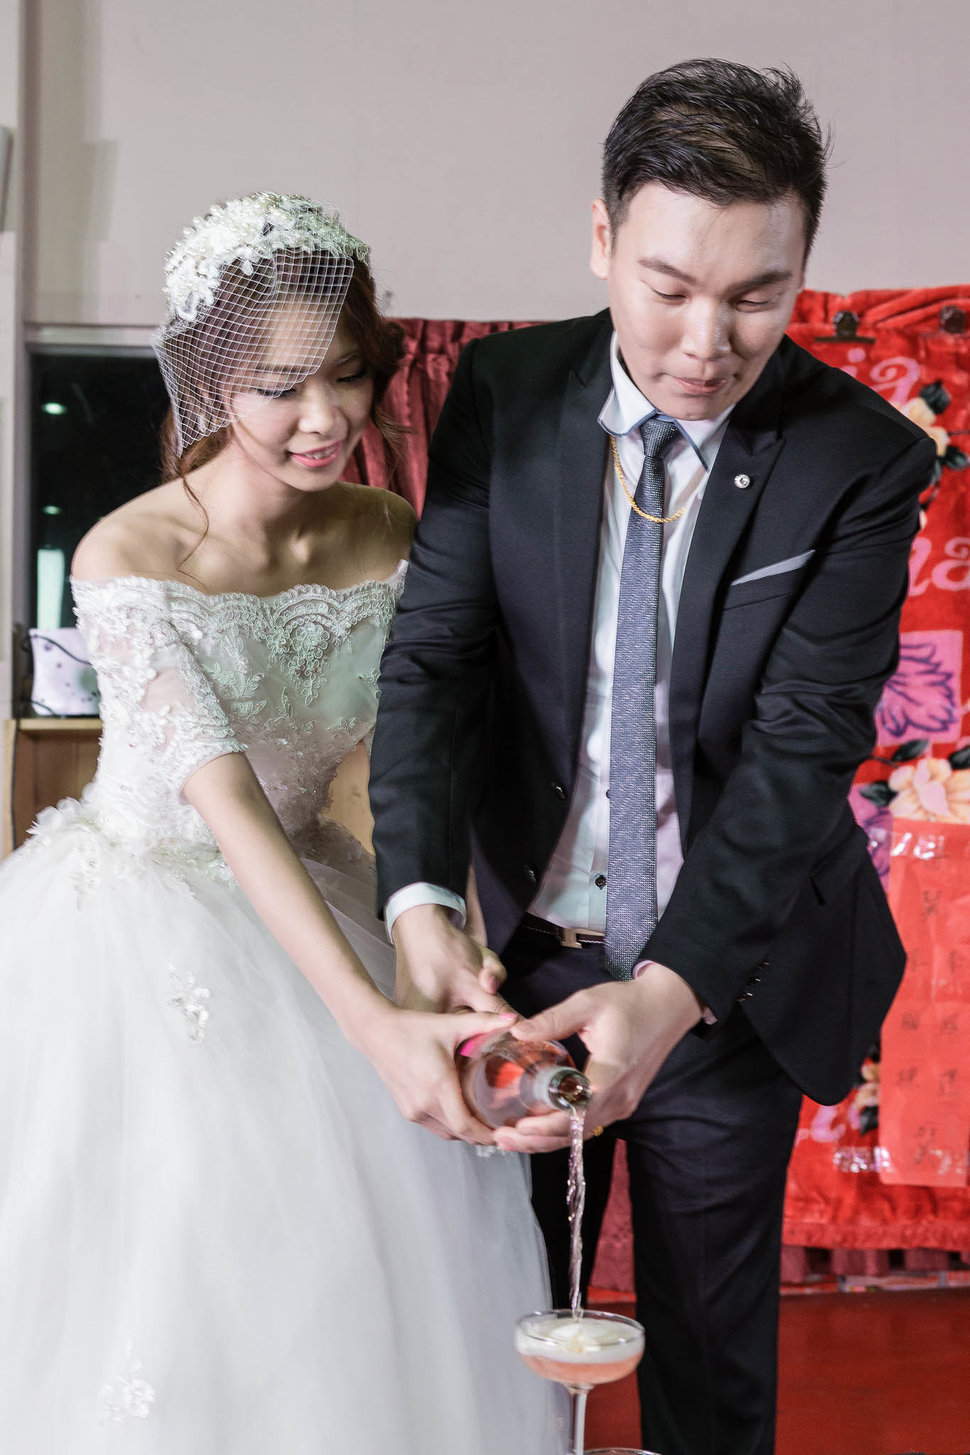 18PHOTO-丯豐❤️ 蕙君(編號:221116) - 18PHOTO 婚紗影像攝影工作室 - 結婚吧